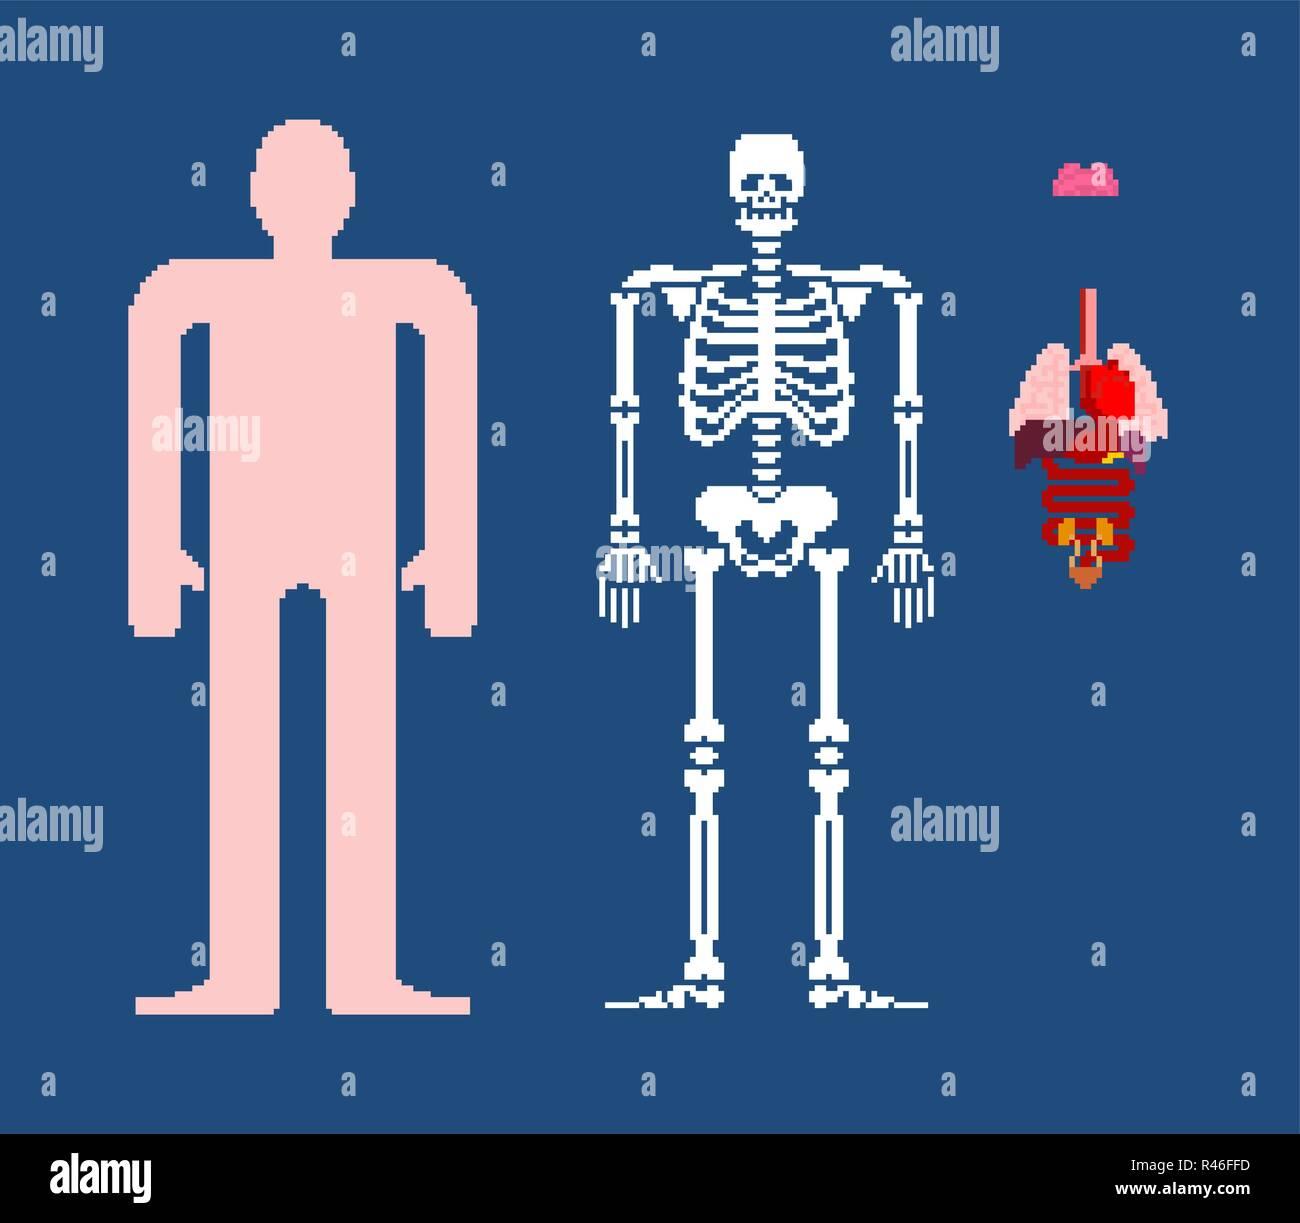 Human anatomy pixel art  8bit Internal organs and skeleton  Pixelate